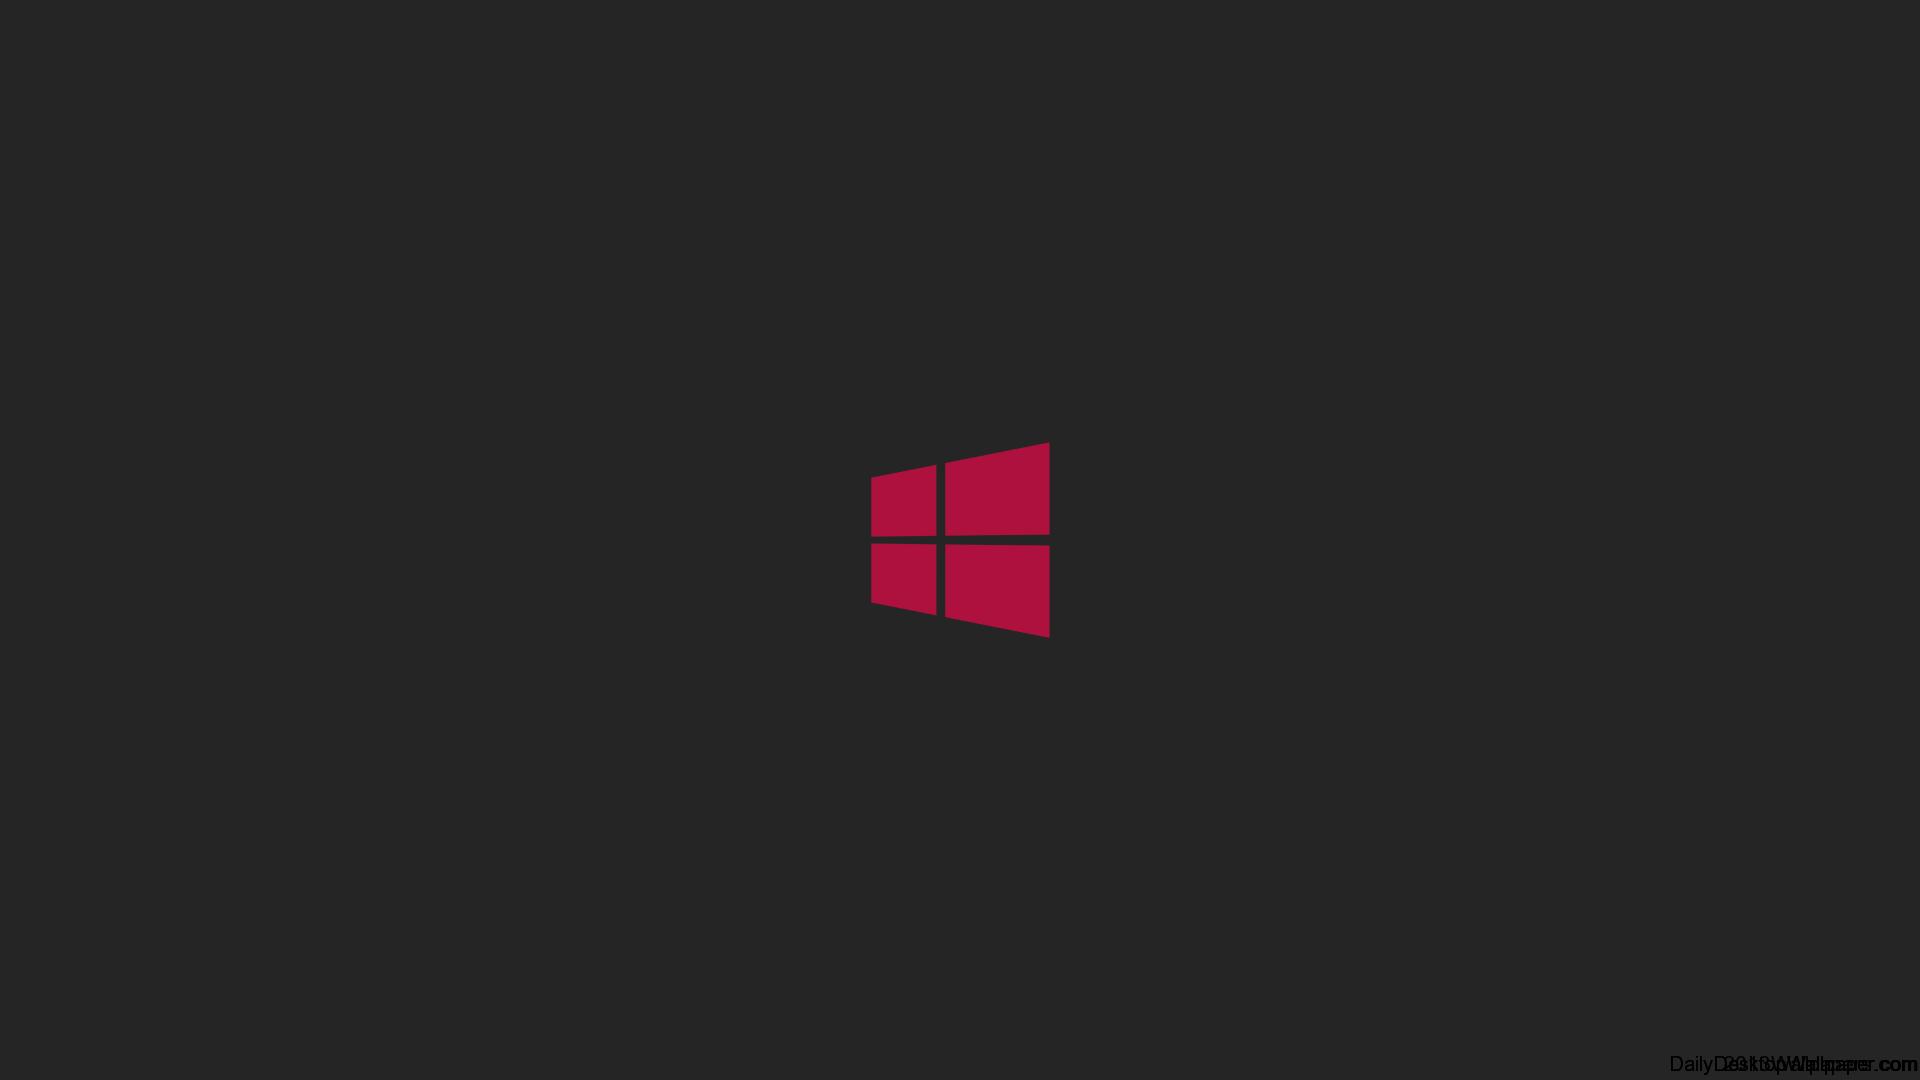 Change Clipart Size Windows 8.